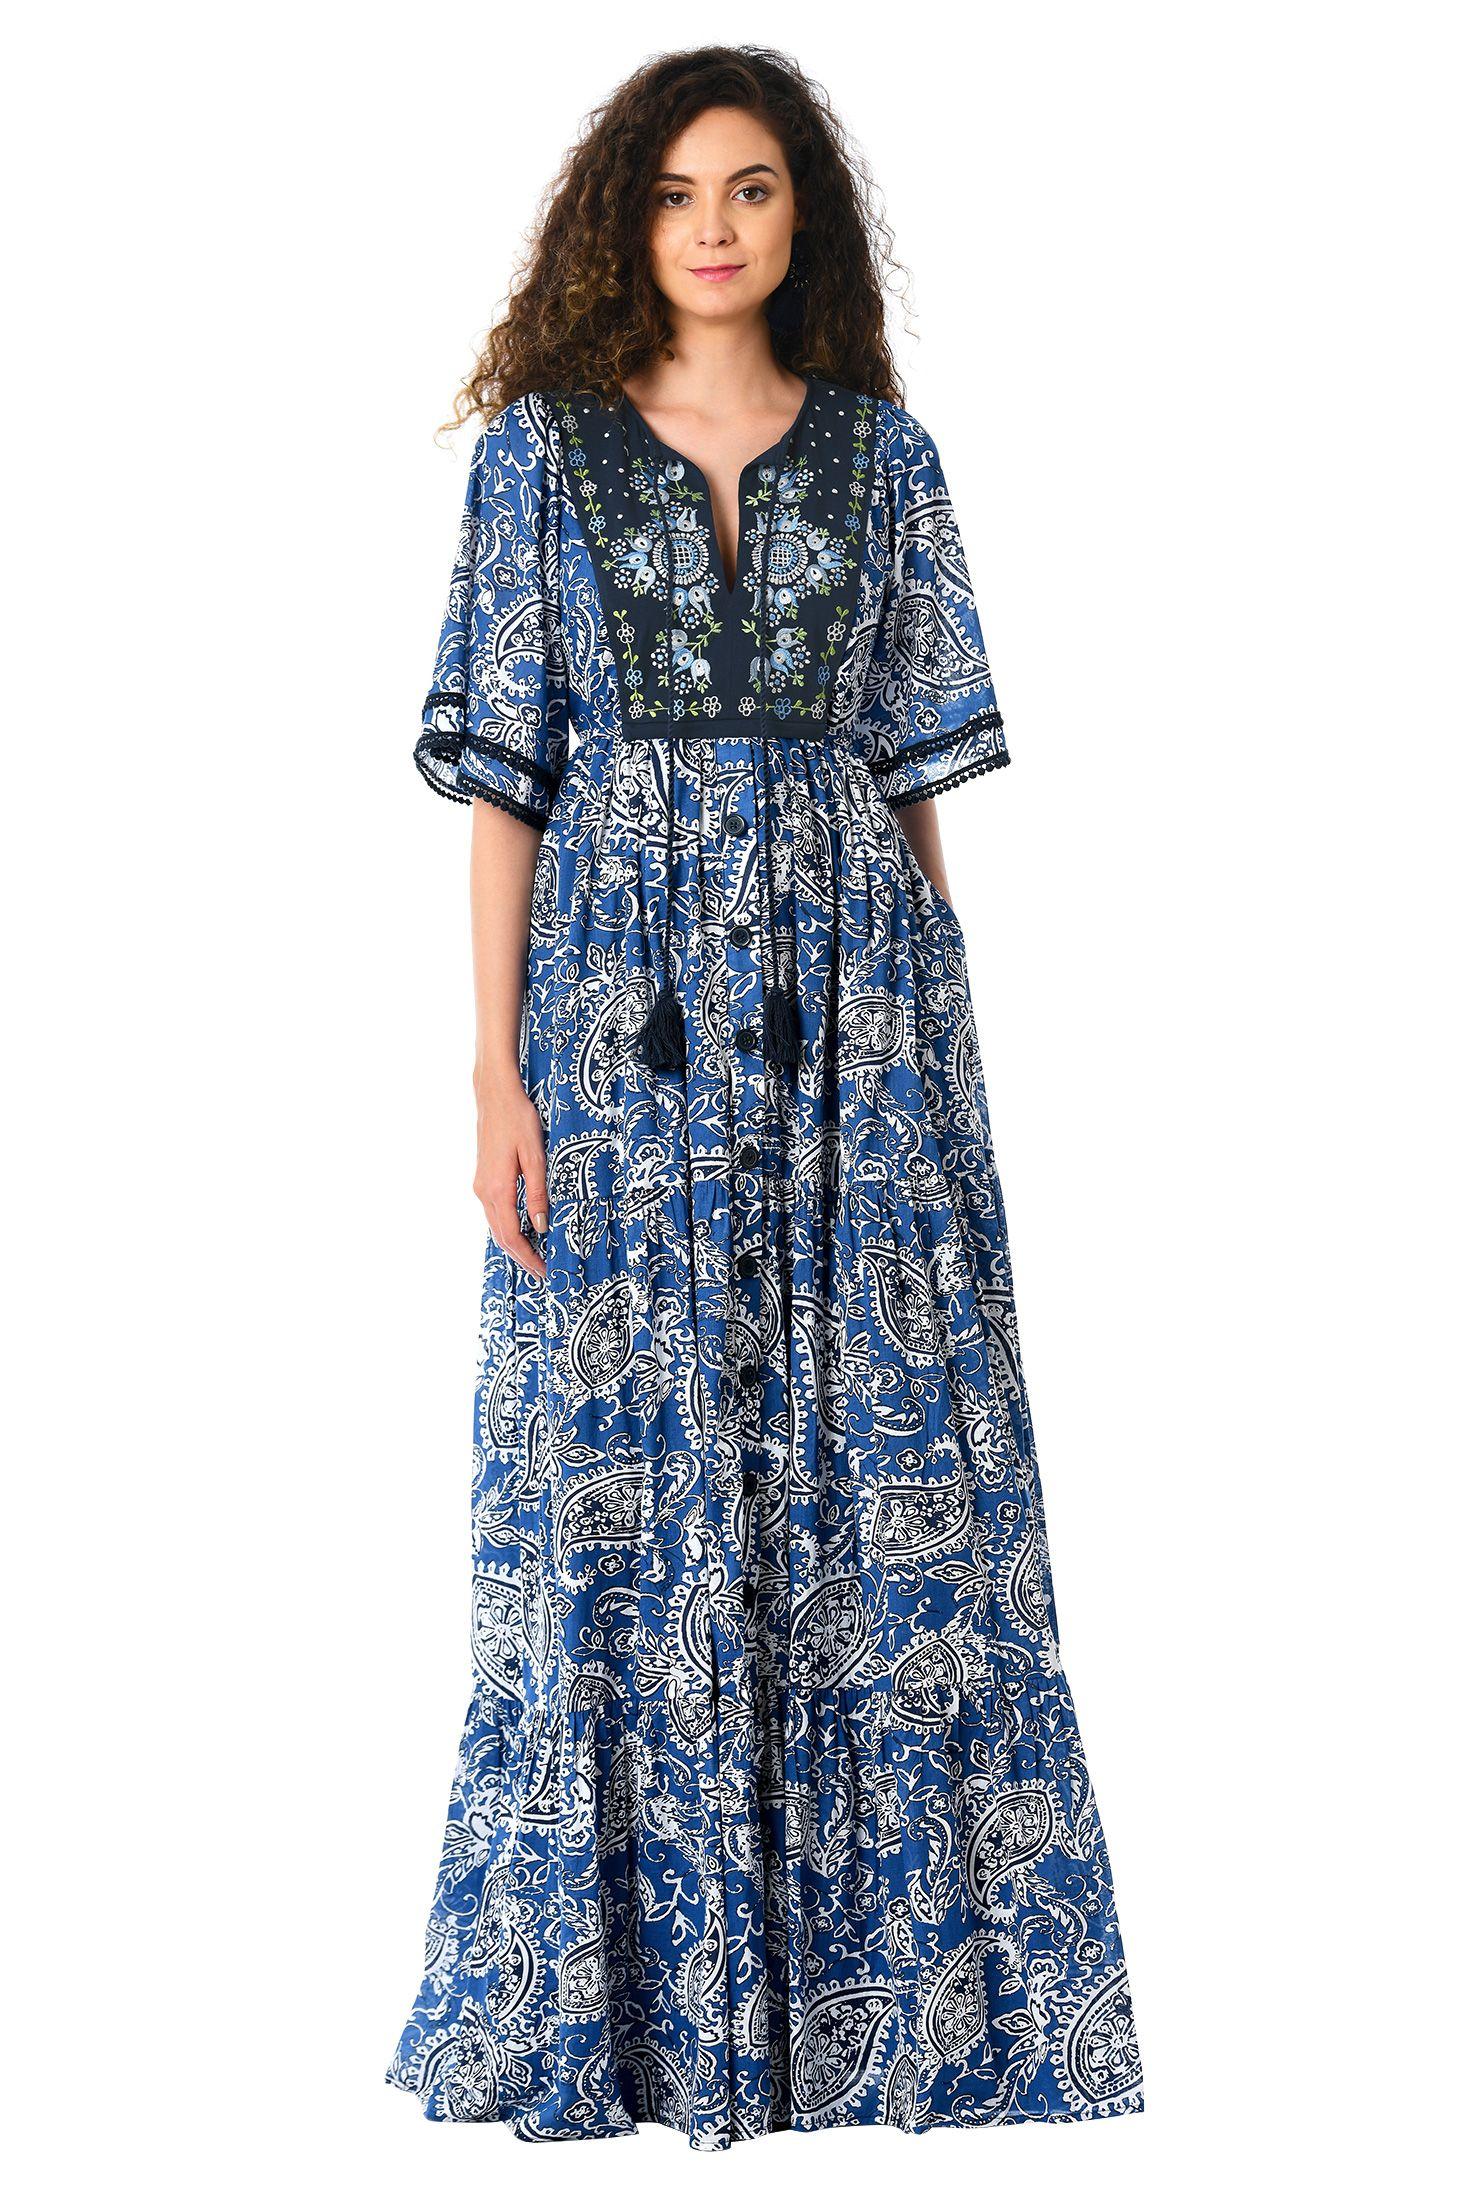 1a94eba3dc Designer women's fashion dresses, day dresses, wrap dress, maxi dresses,  casual, occasion, kaftans, caftans, sheath dress, shift dress, empire  dress, ...